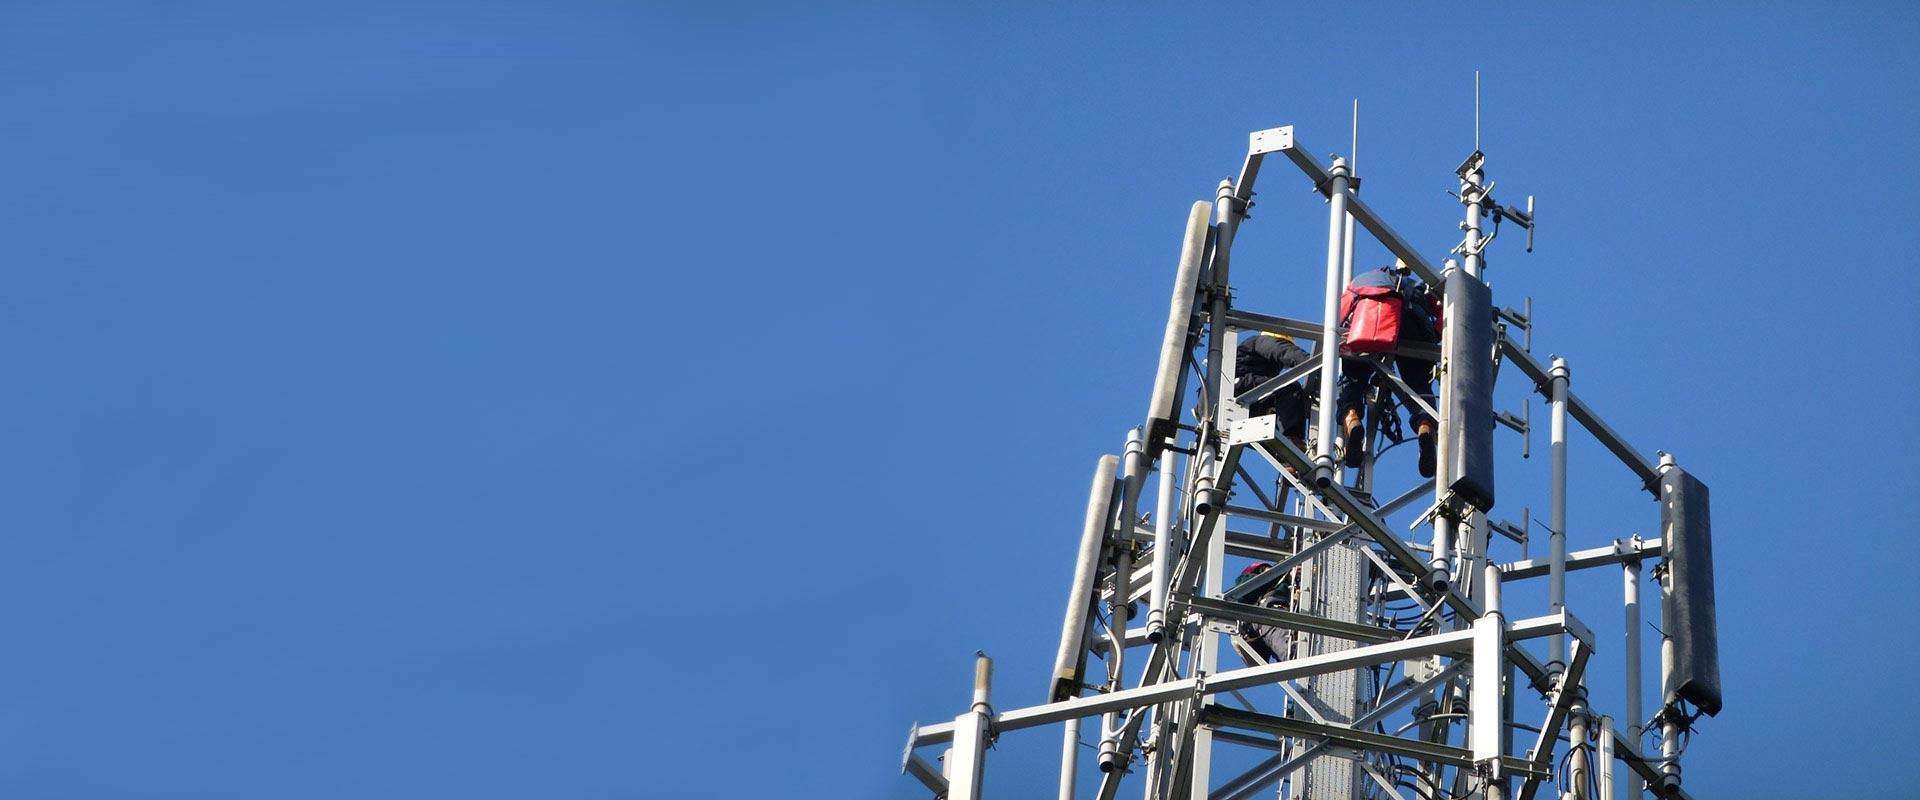 Telecoms_header_2